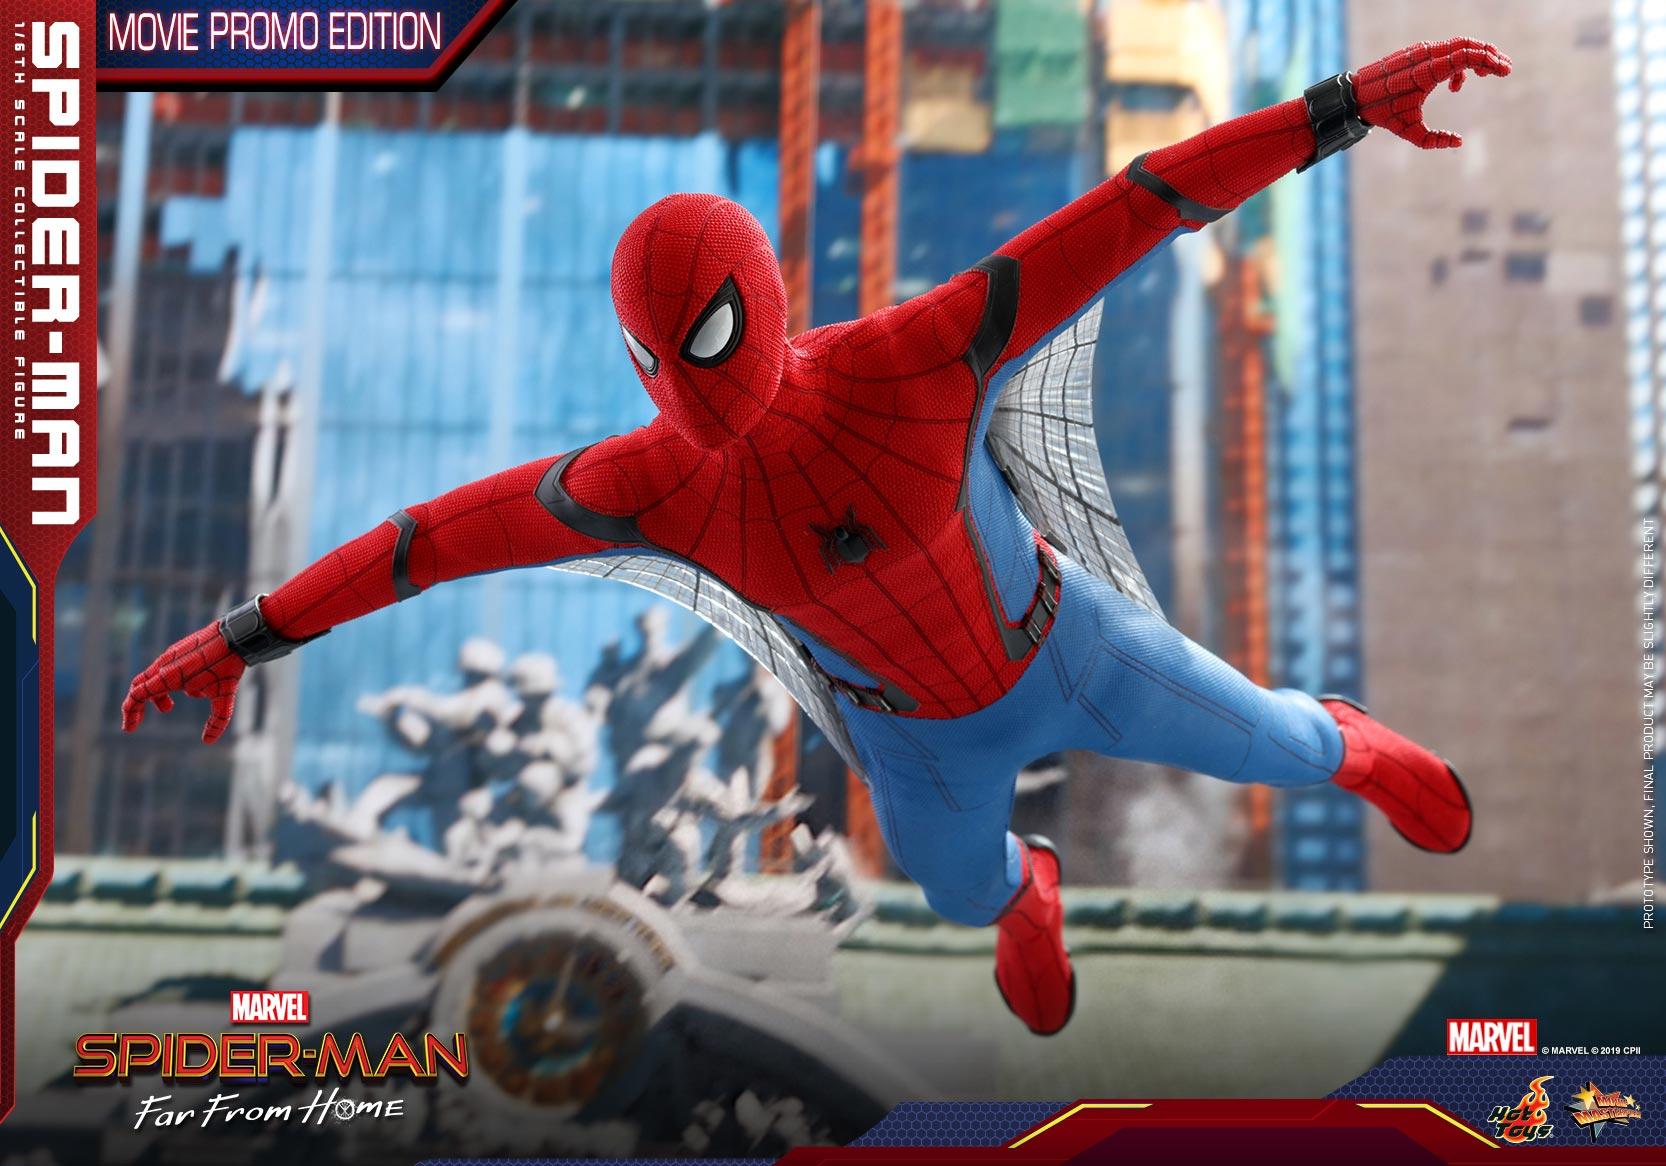 Hot-Toys---SMFFH---Spider-Man-(Movie-Promo-Edition)-collectible-figure_PR11